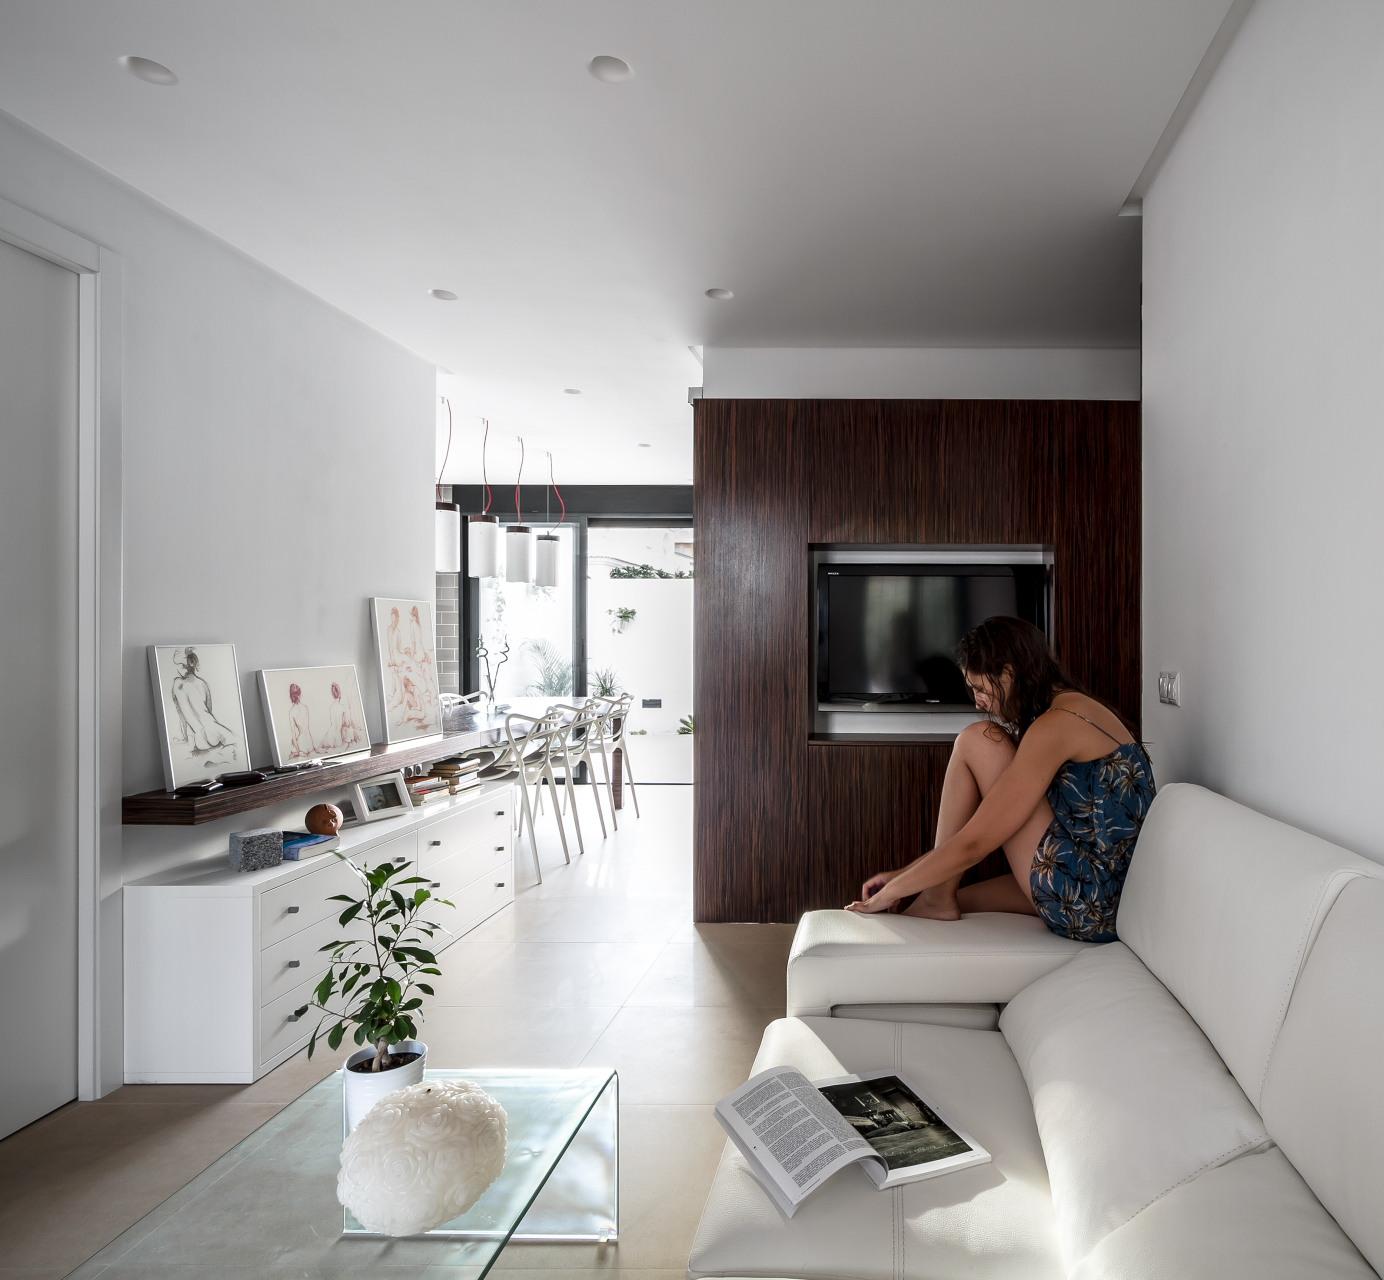 fotografia-arquitectura-valencia-german-cabo-selecta-home-denia (16)